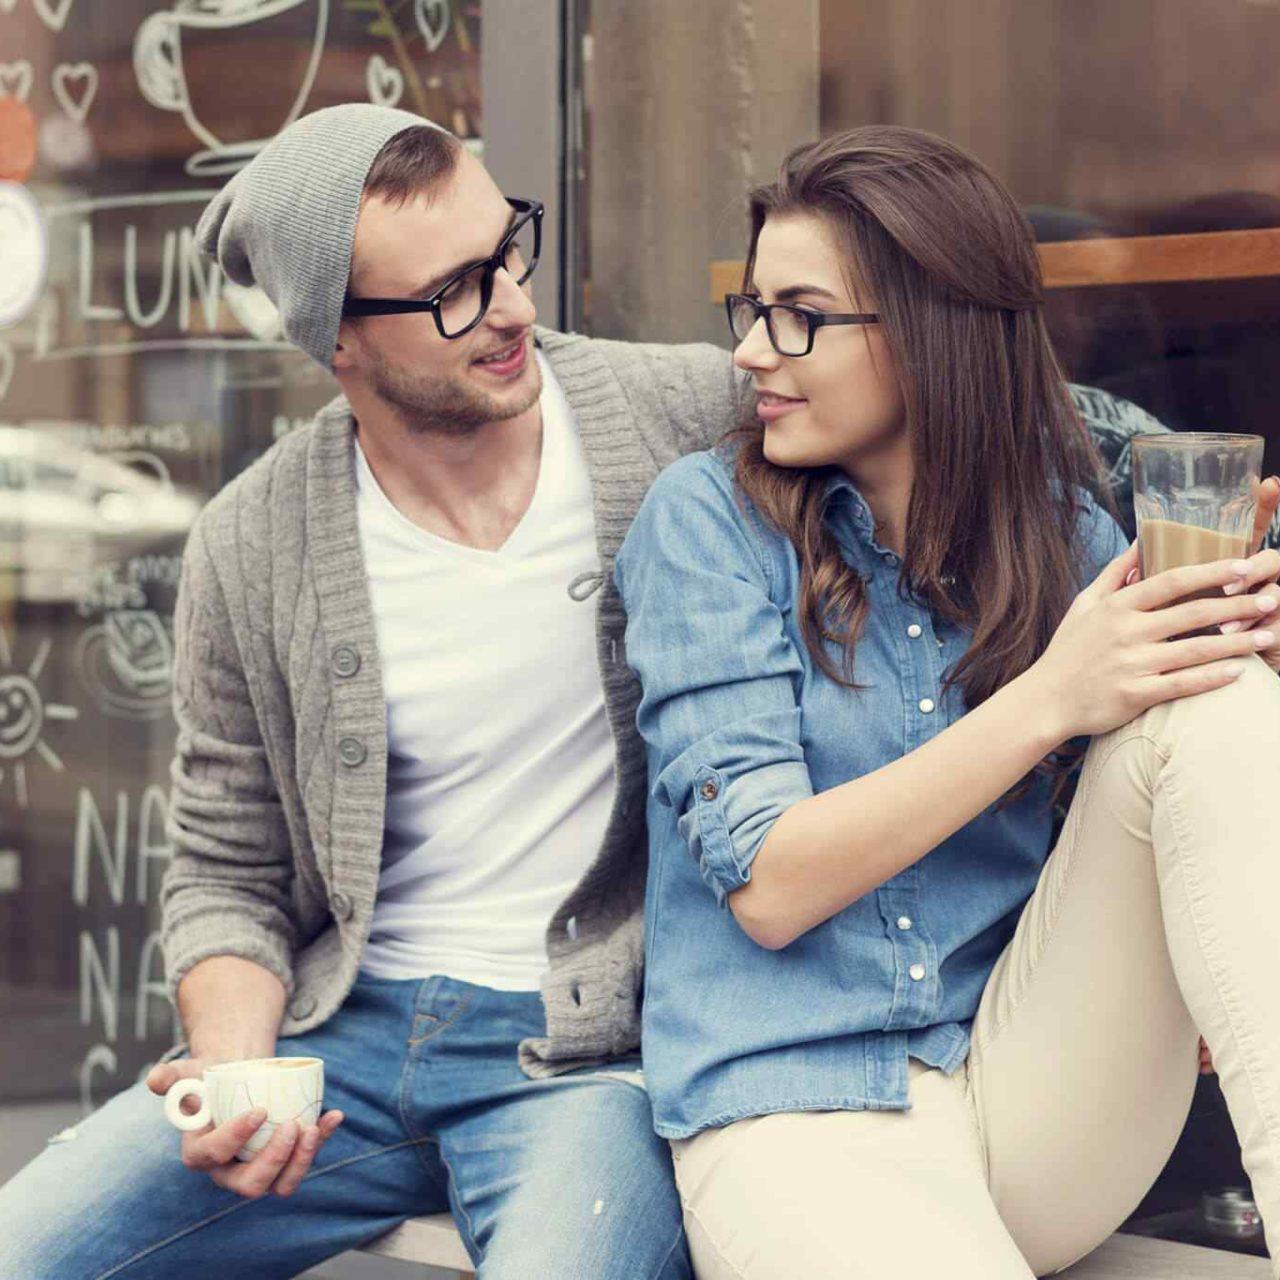 https://loenne.info/wp-content/uploads/2018/01/img-class-marriage-02-1280x1280.jpg